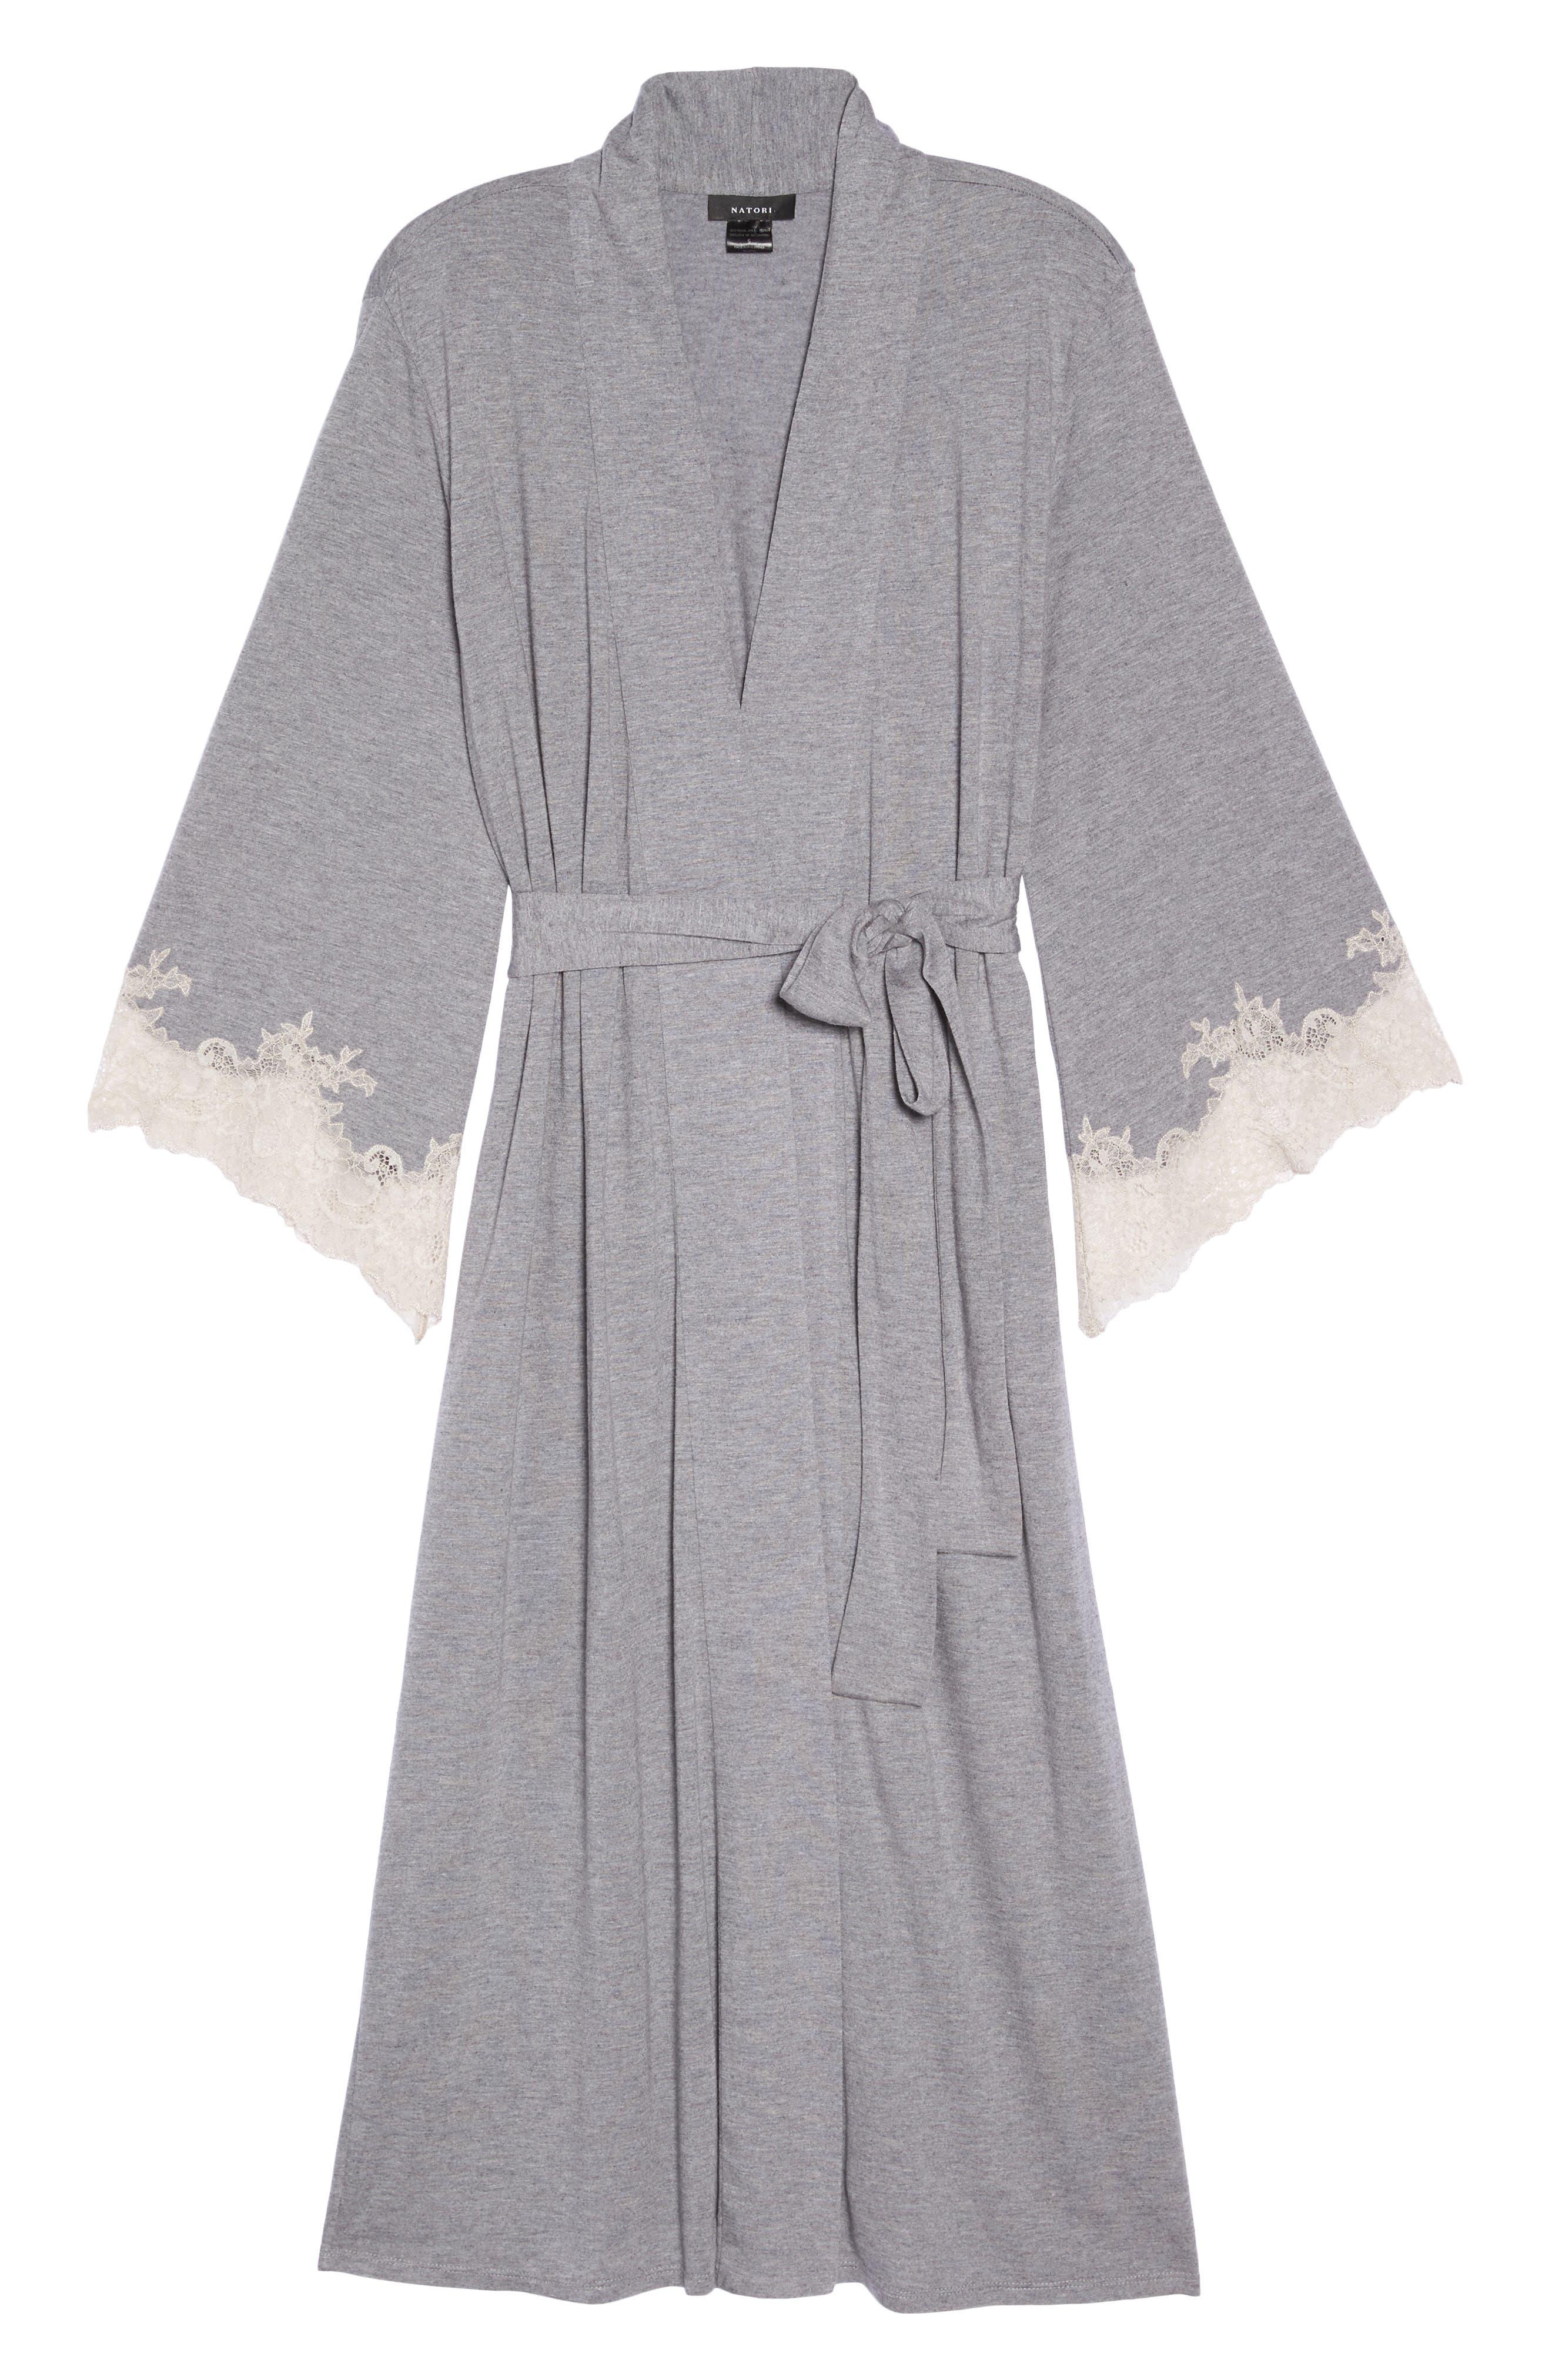 Luxe Shangri-La Robe,                             Alternate thumbnail 6, color,                             GREY